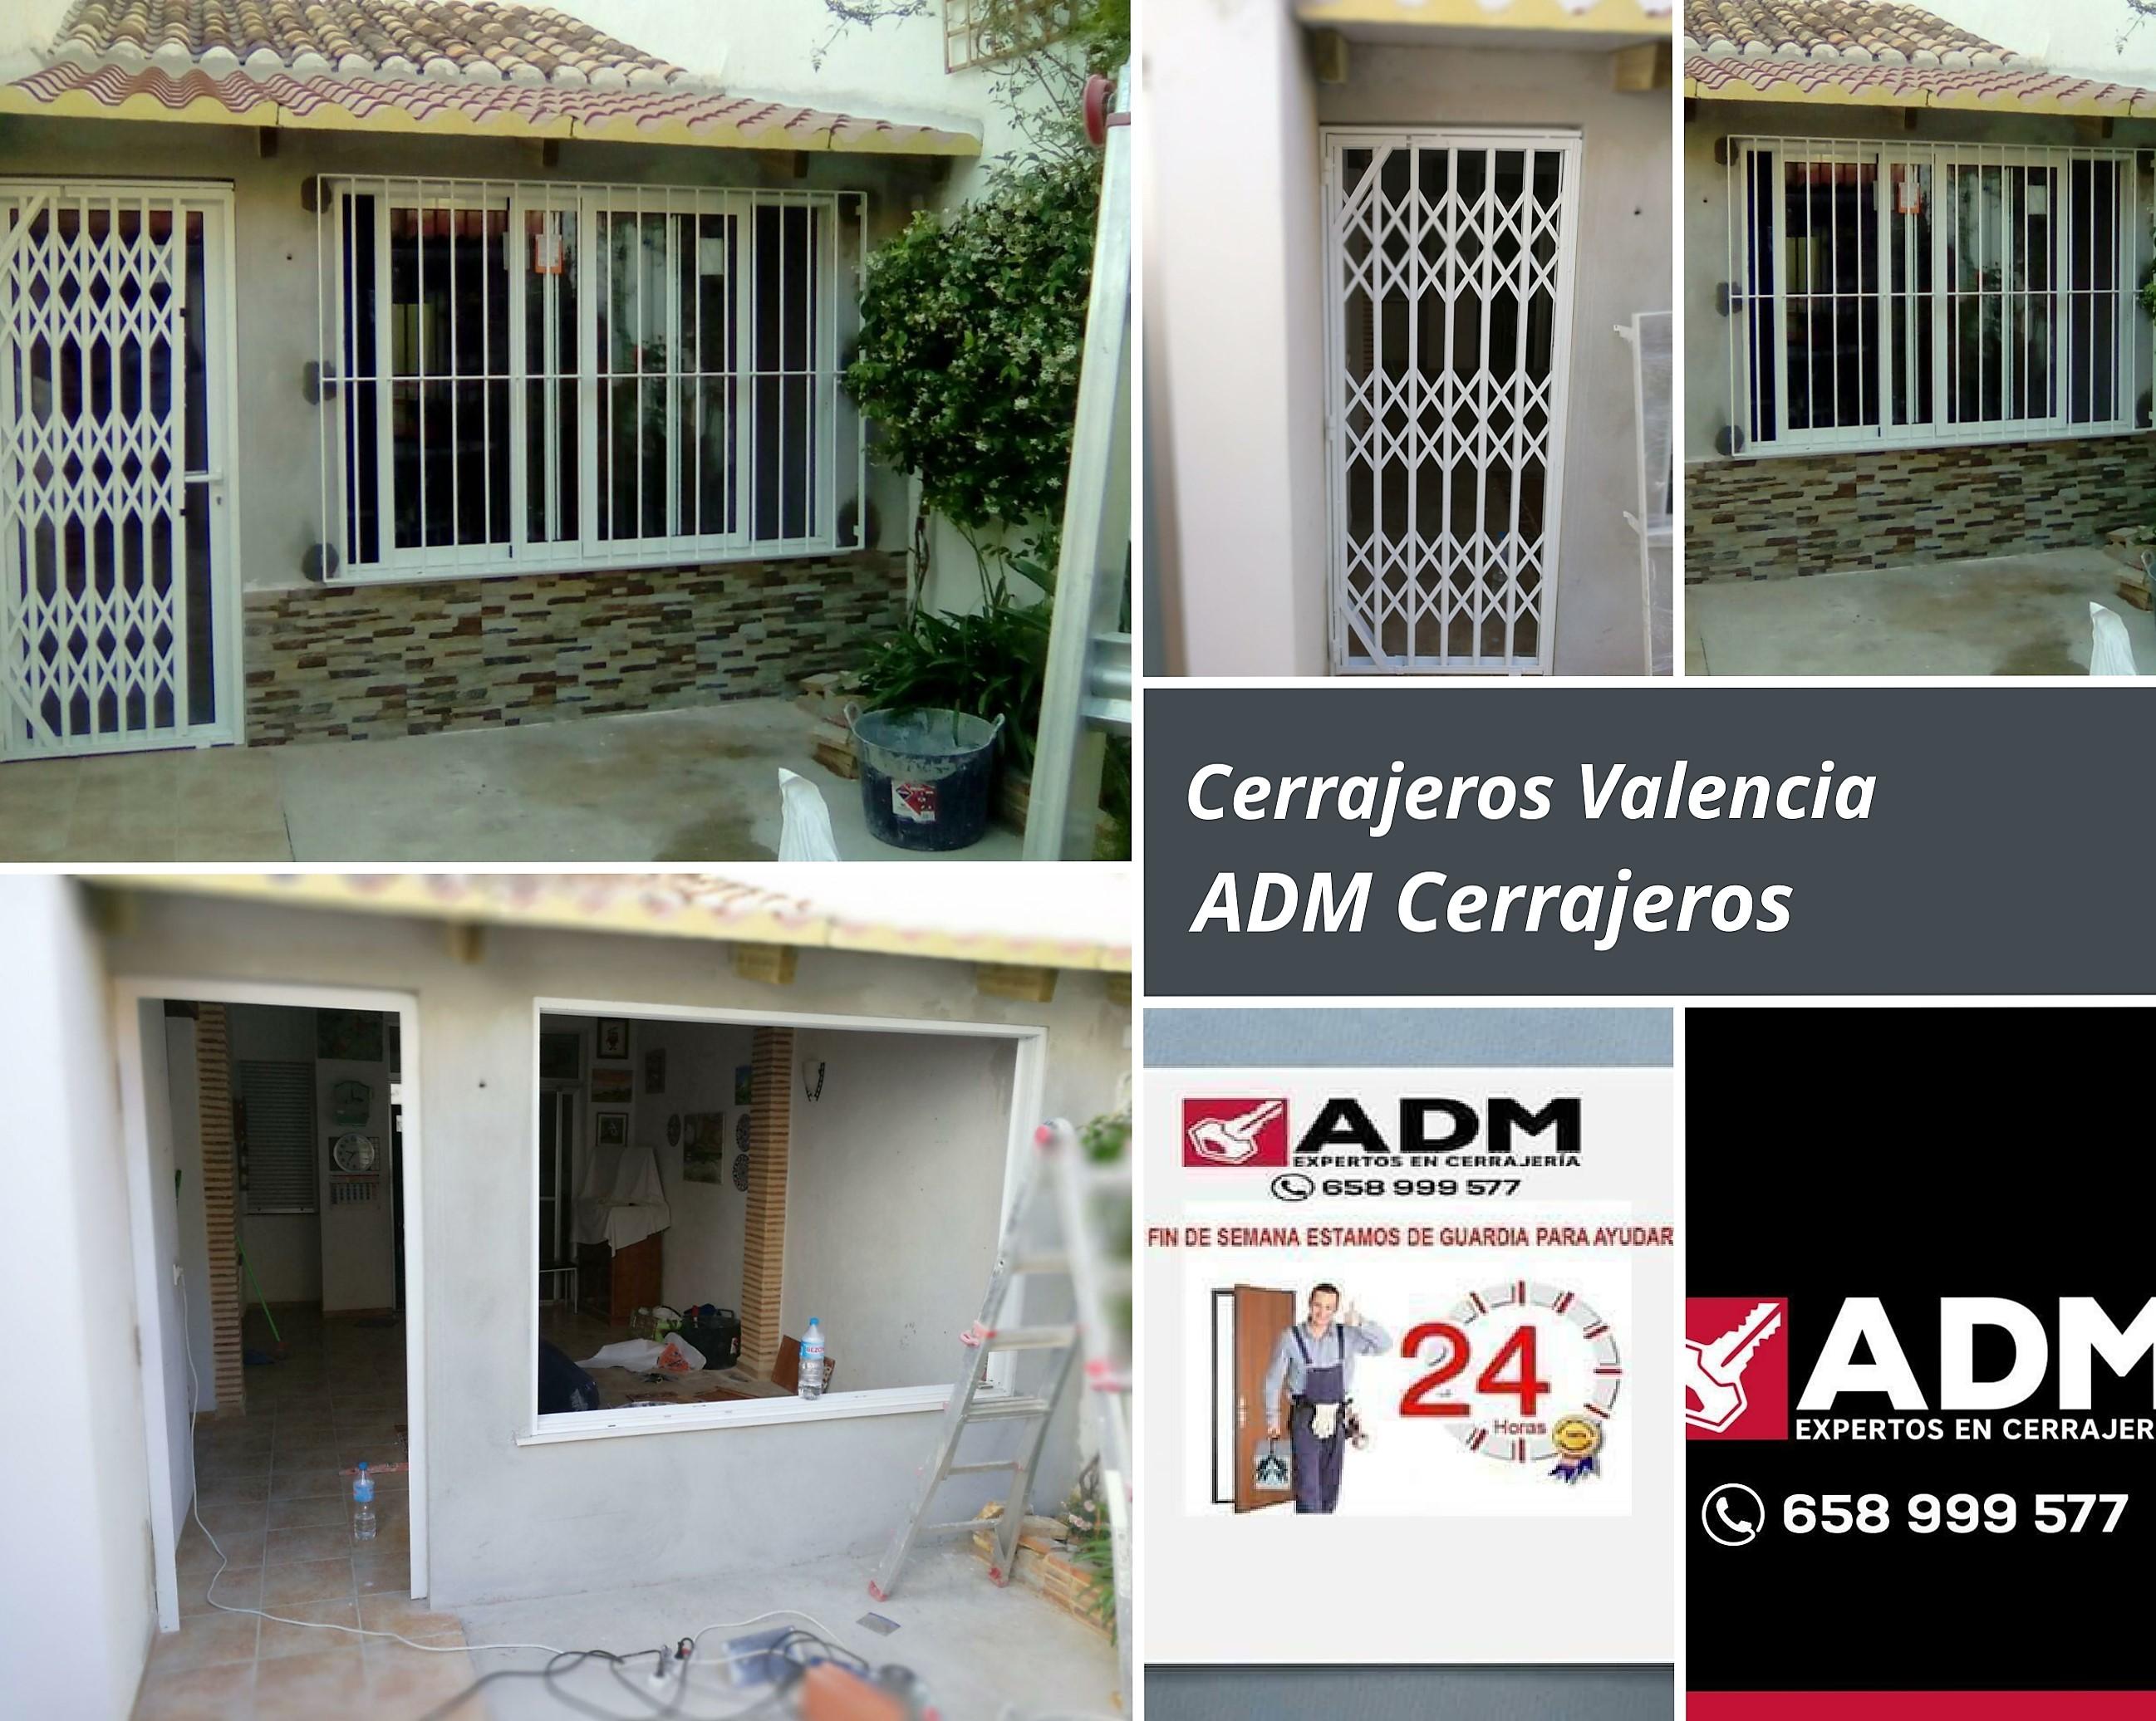 Cerrajeros valencia 24 horas adm 658 999 577 - Cerrajeros 24h valencia ...